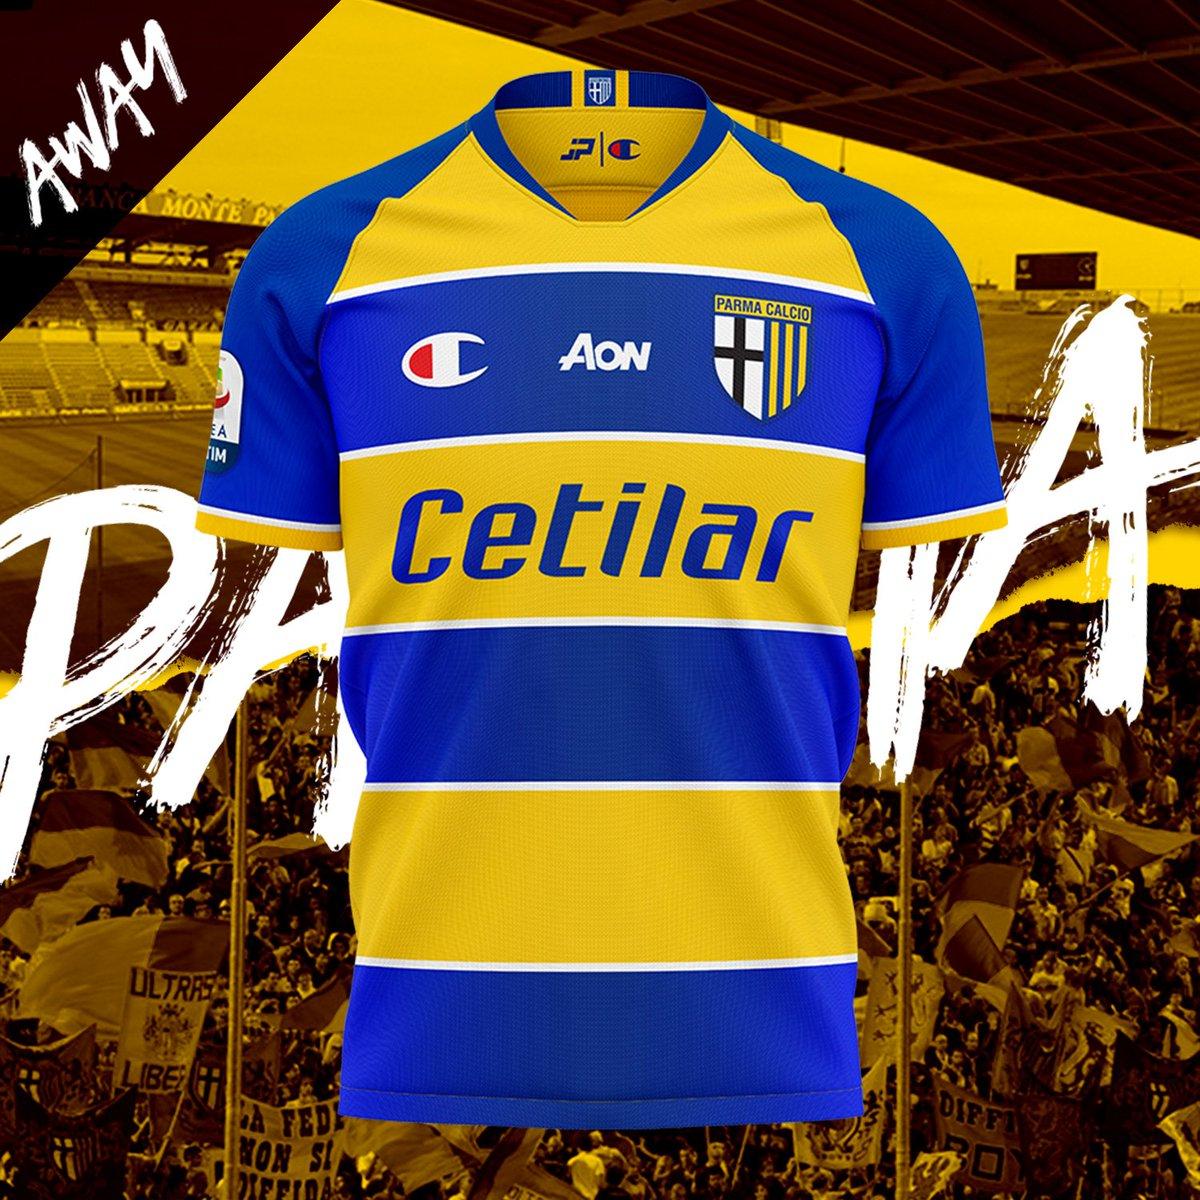 5db5ac483 ...  ConceptKit  KitDesign  Soccer  Football  Jersey  FootyHeadlines   GraphicDesign  Champion  FIFA  Kit  SerieA  Italypic.twitter.com WQcWIecGVj